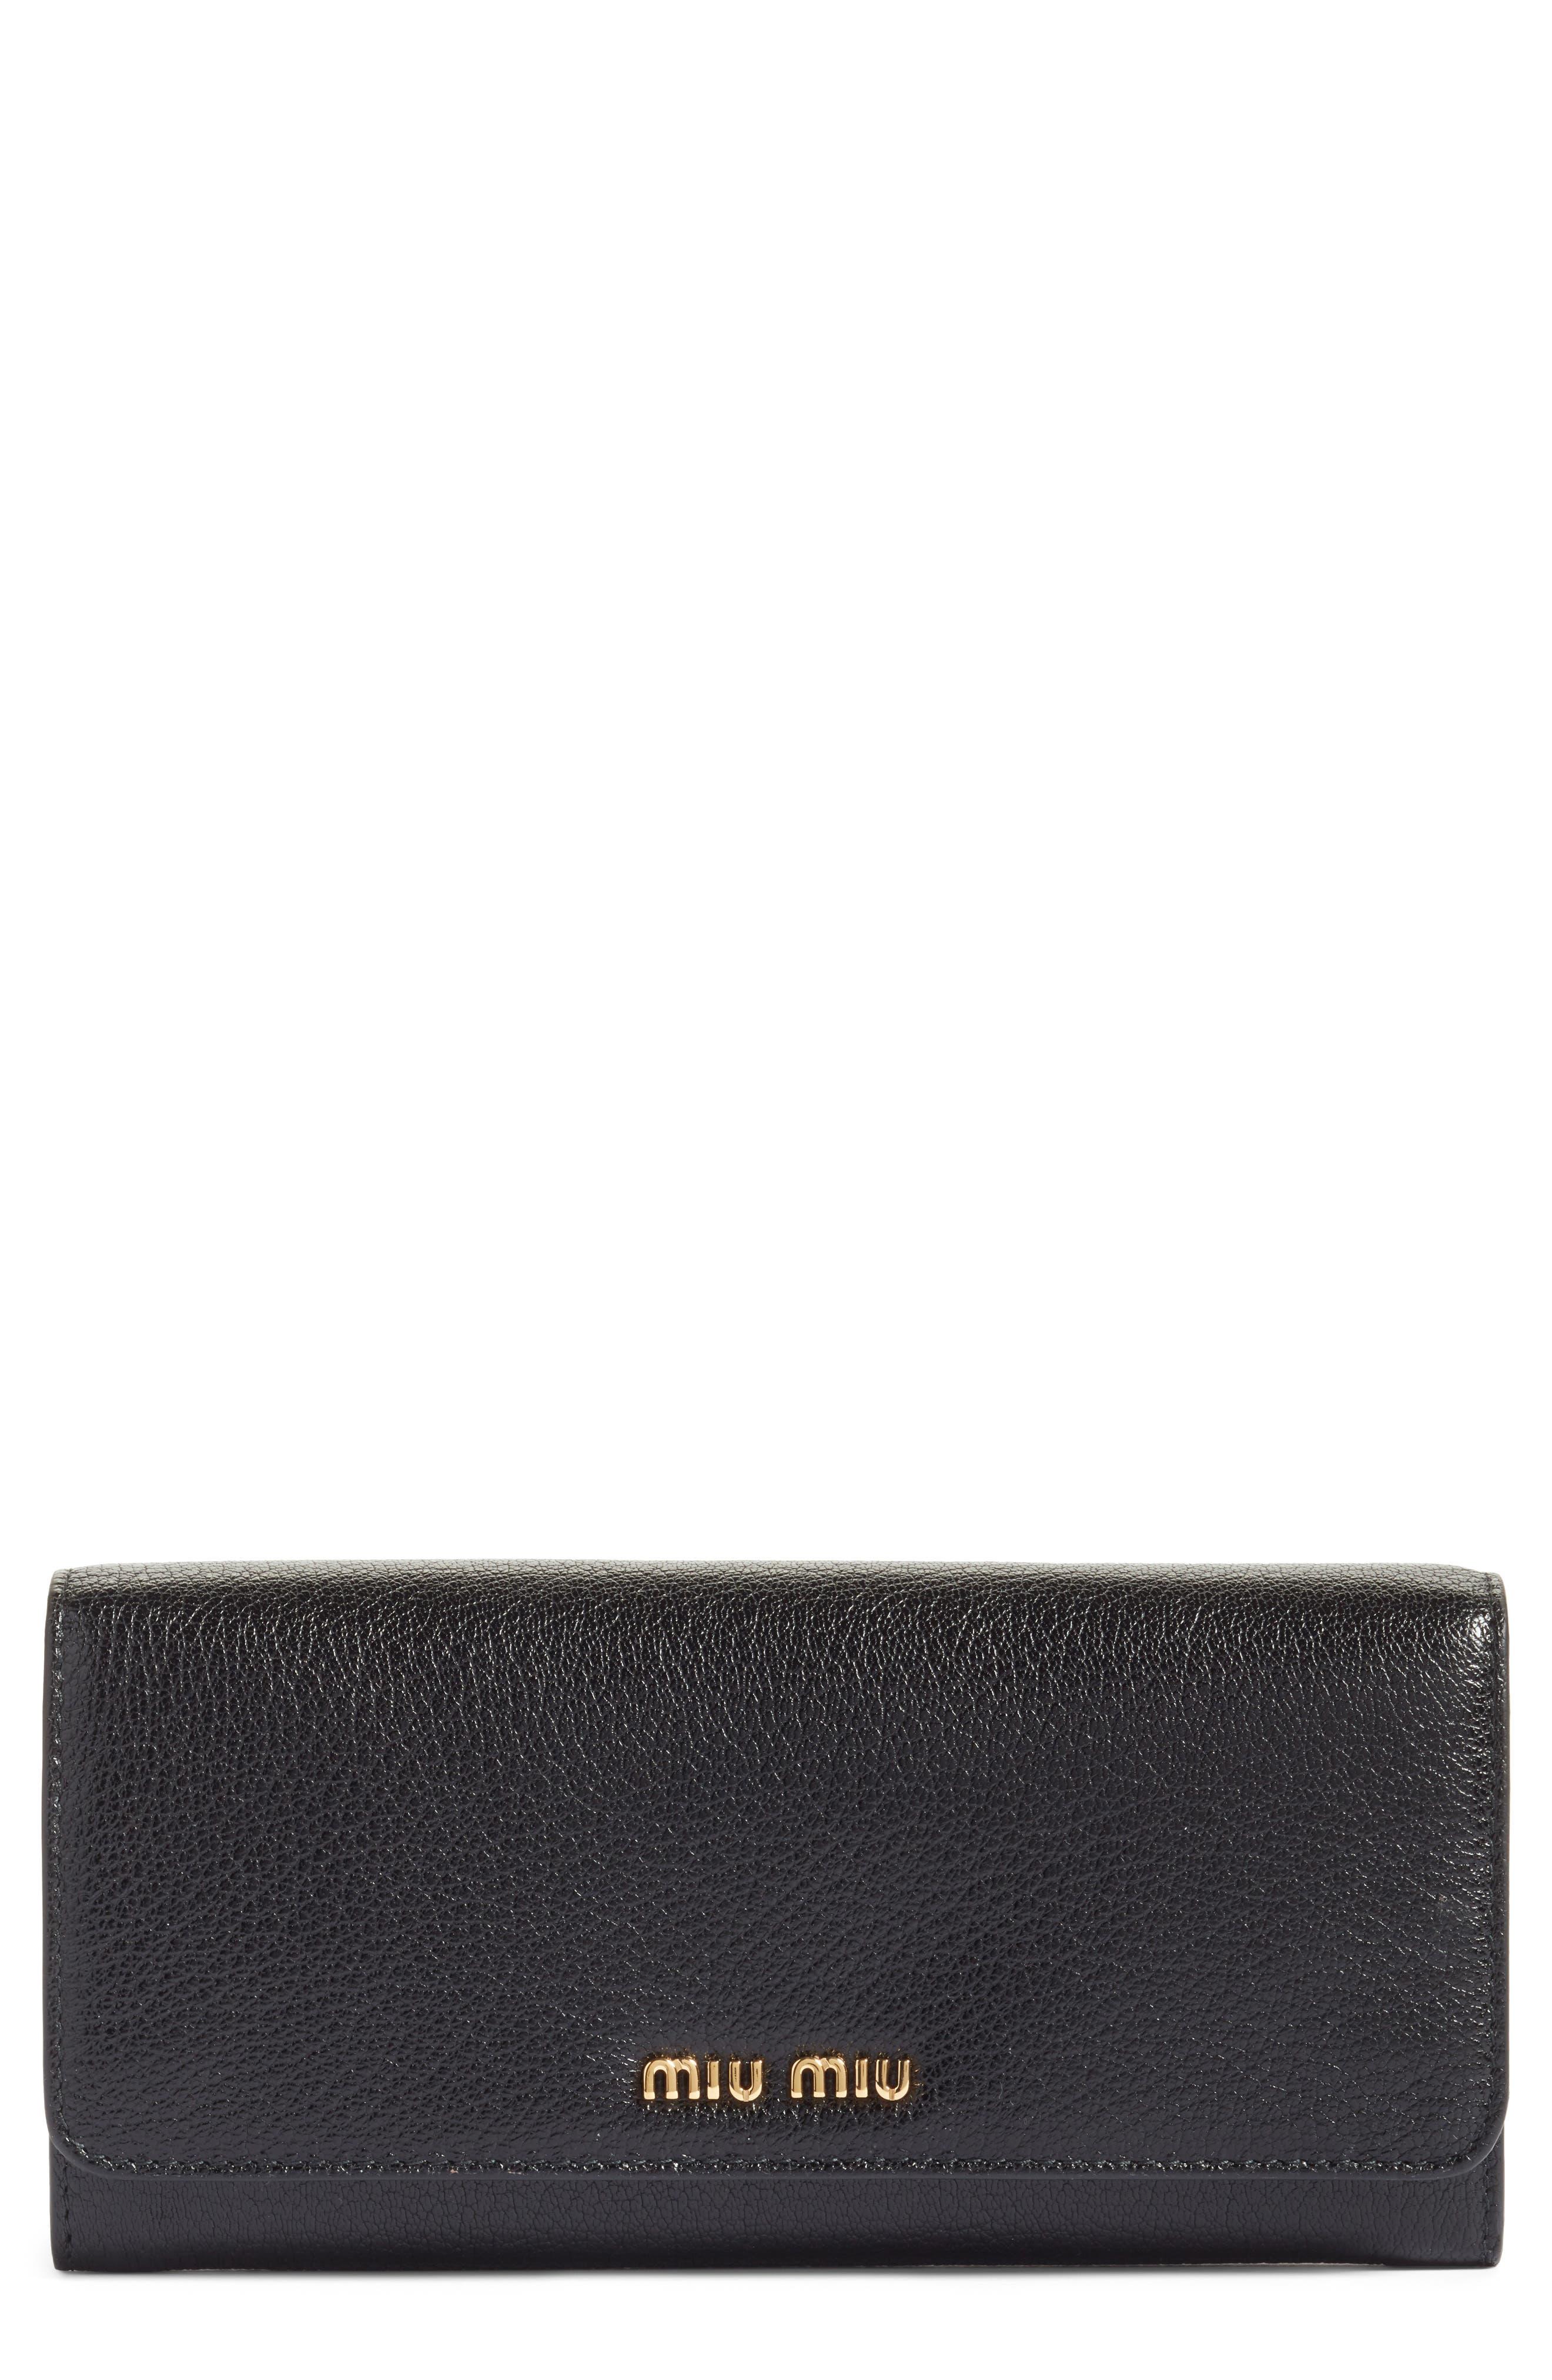 Alternate Image 1 Selected - Miu Miu Madras Leather Continental Wallet